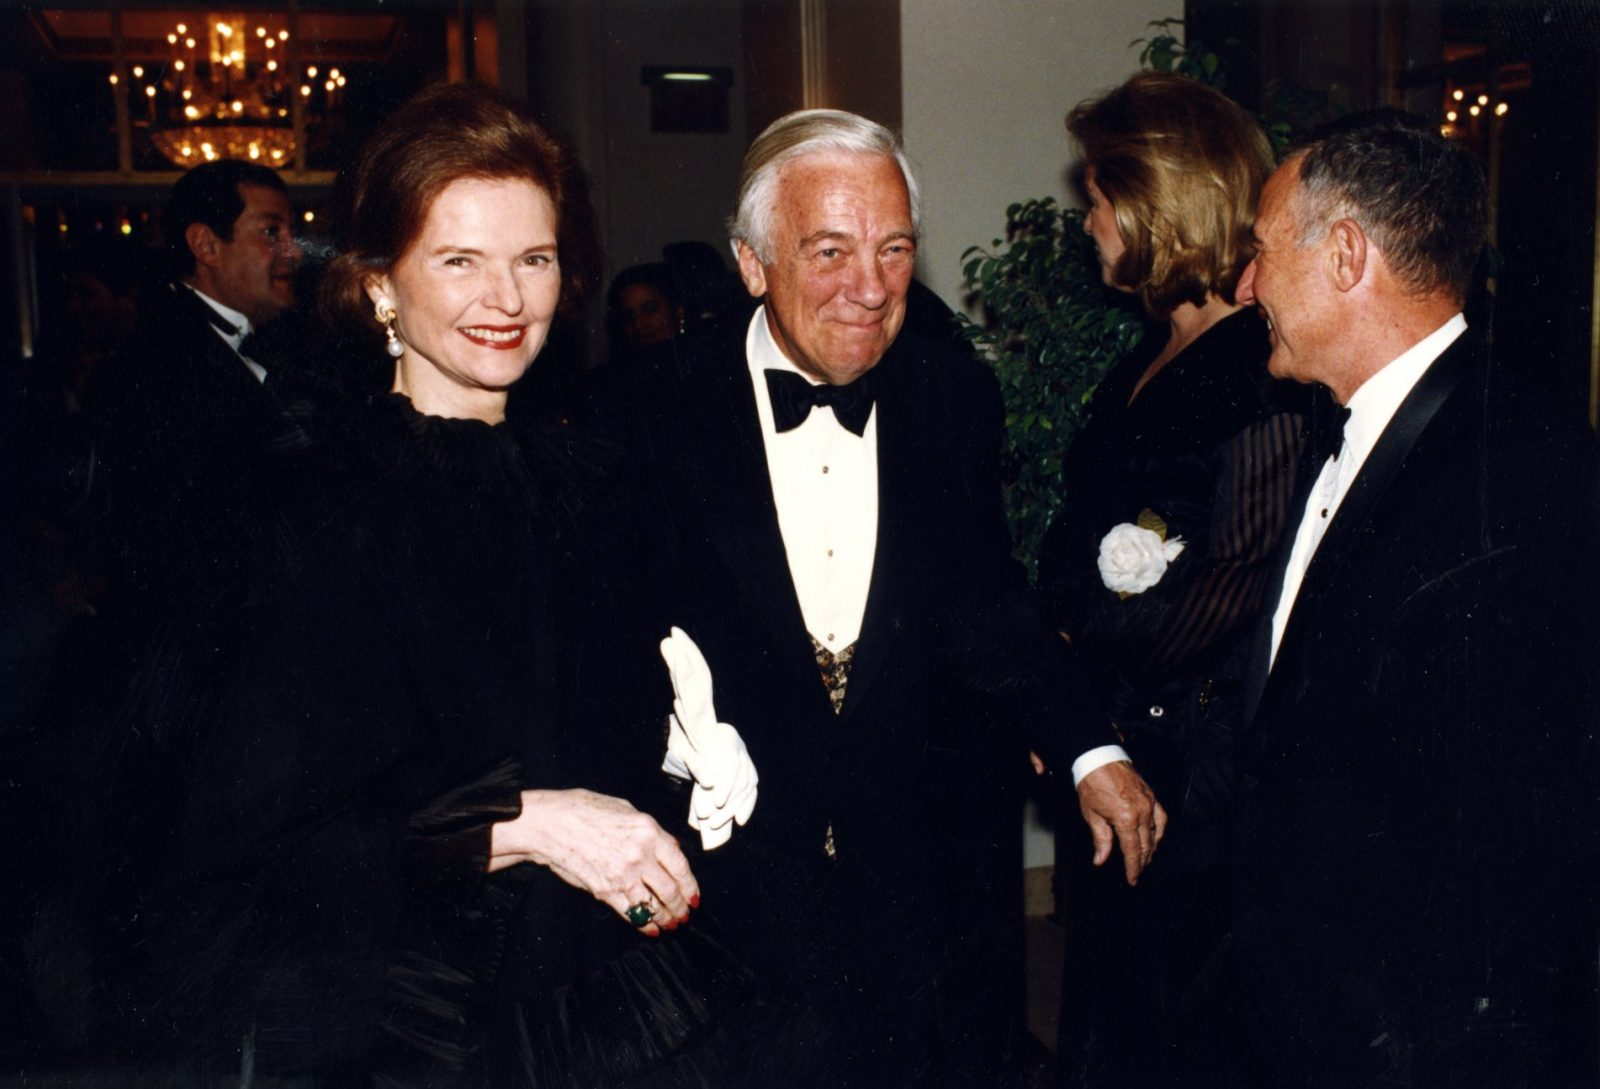 Nancy and John C. Whitehead